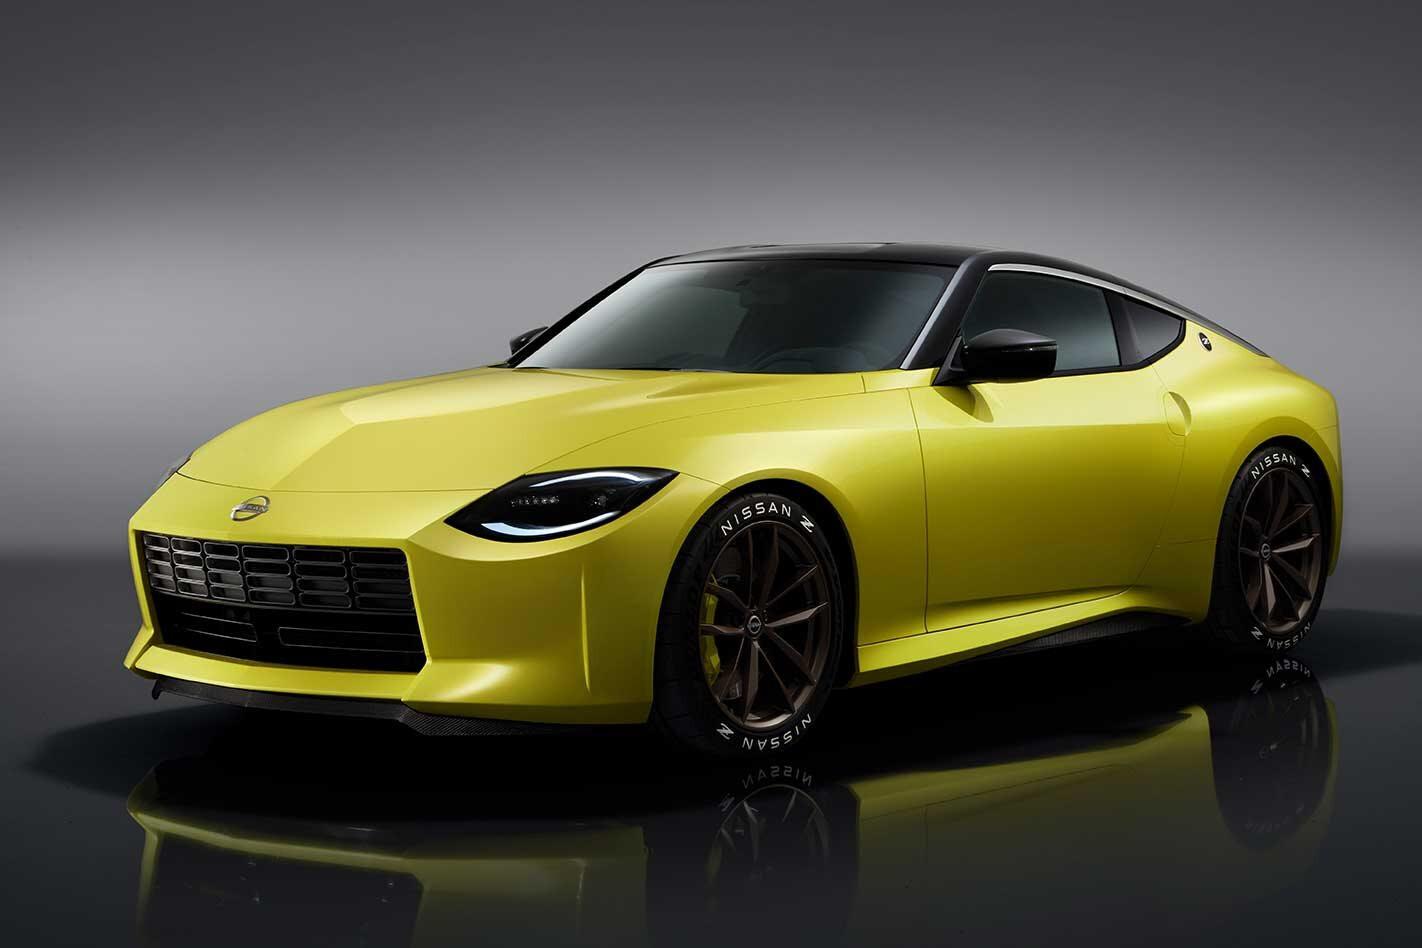 Nissan Z Proto revealed